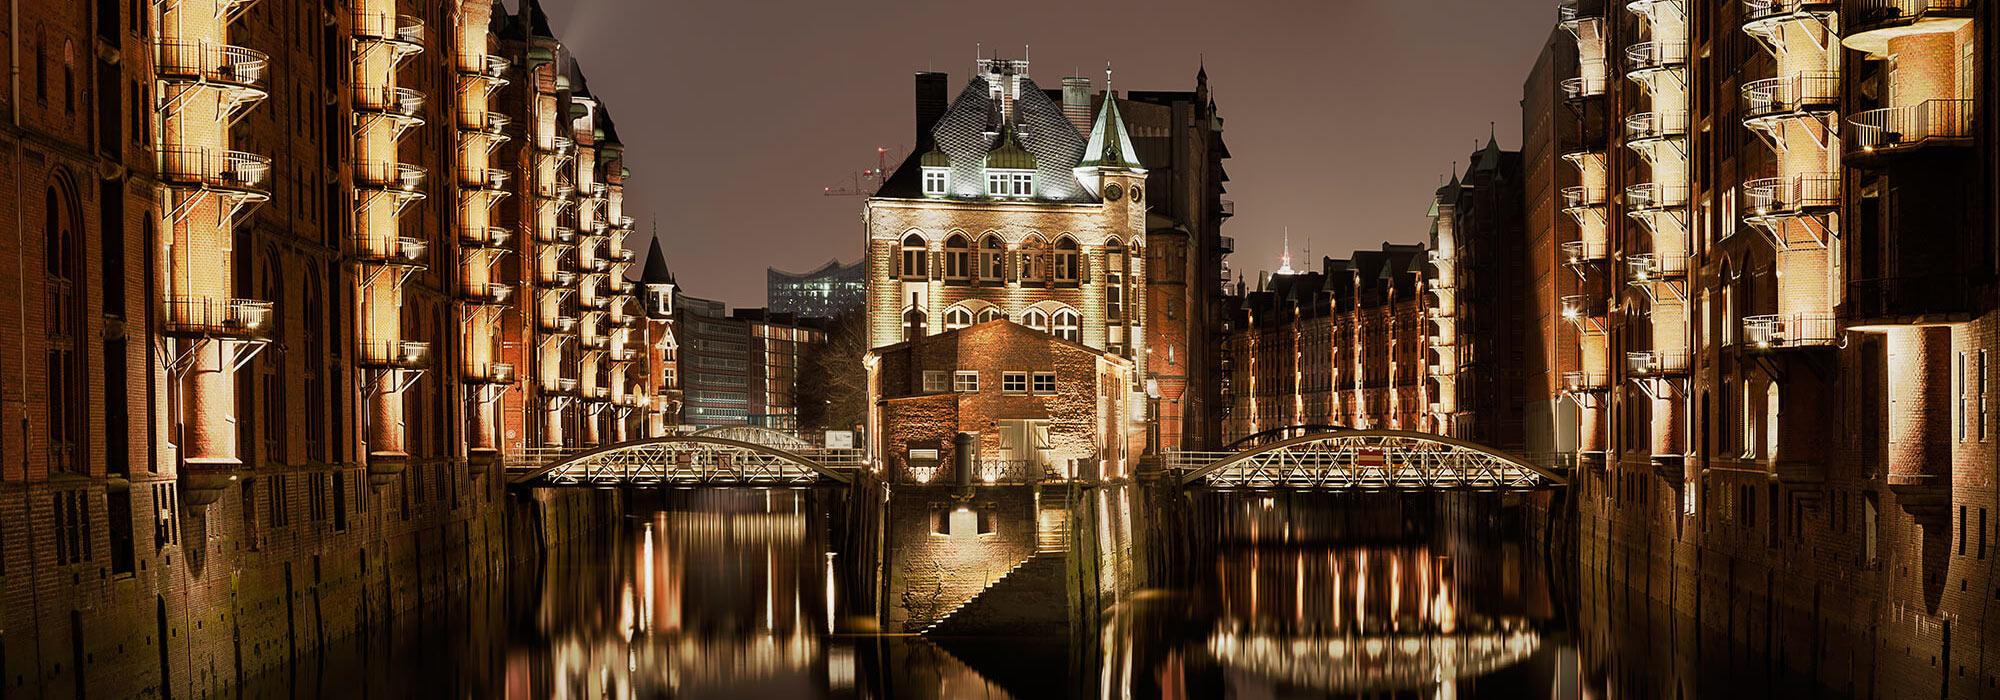 Wasserschloss-Speicherstadt-Hamburg-Teekontor